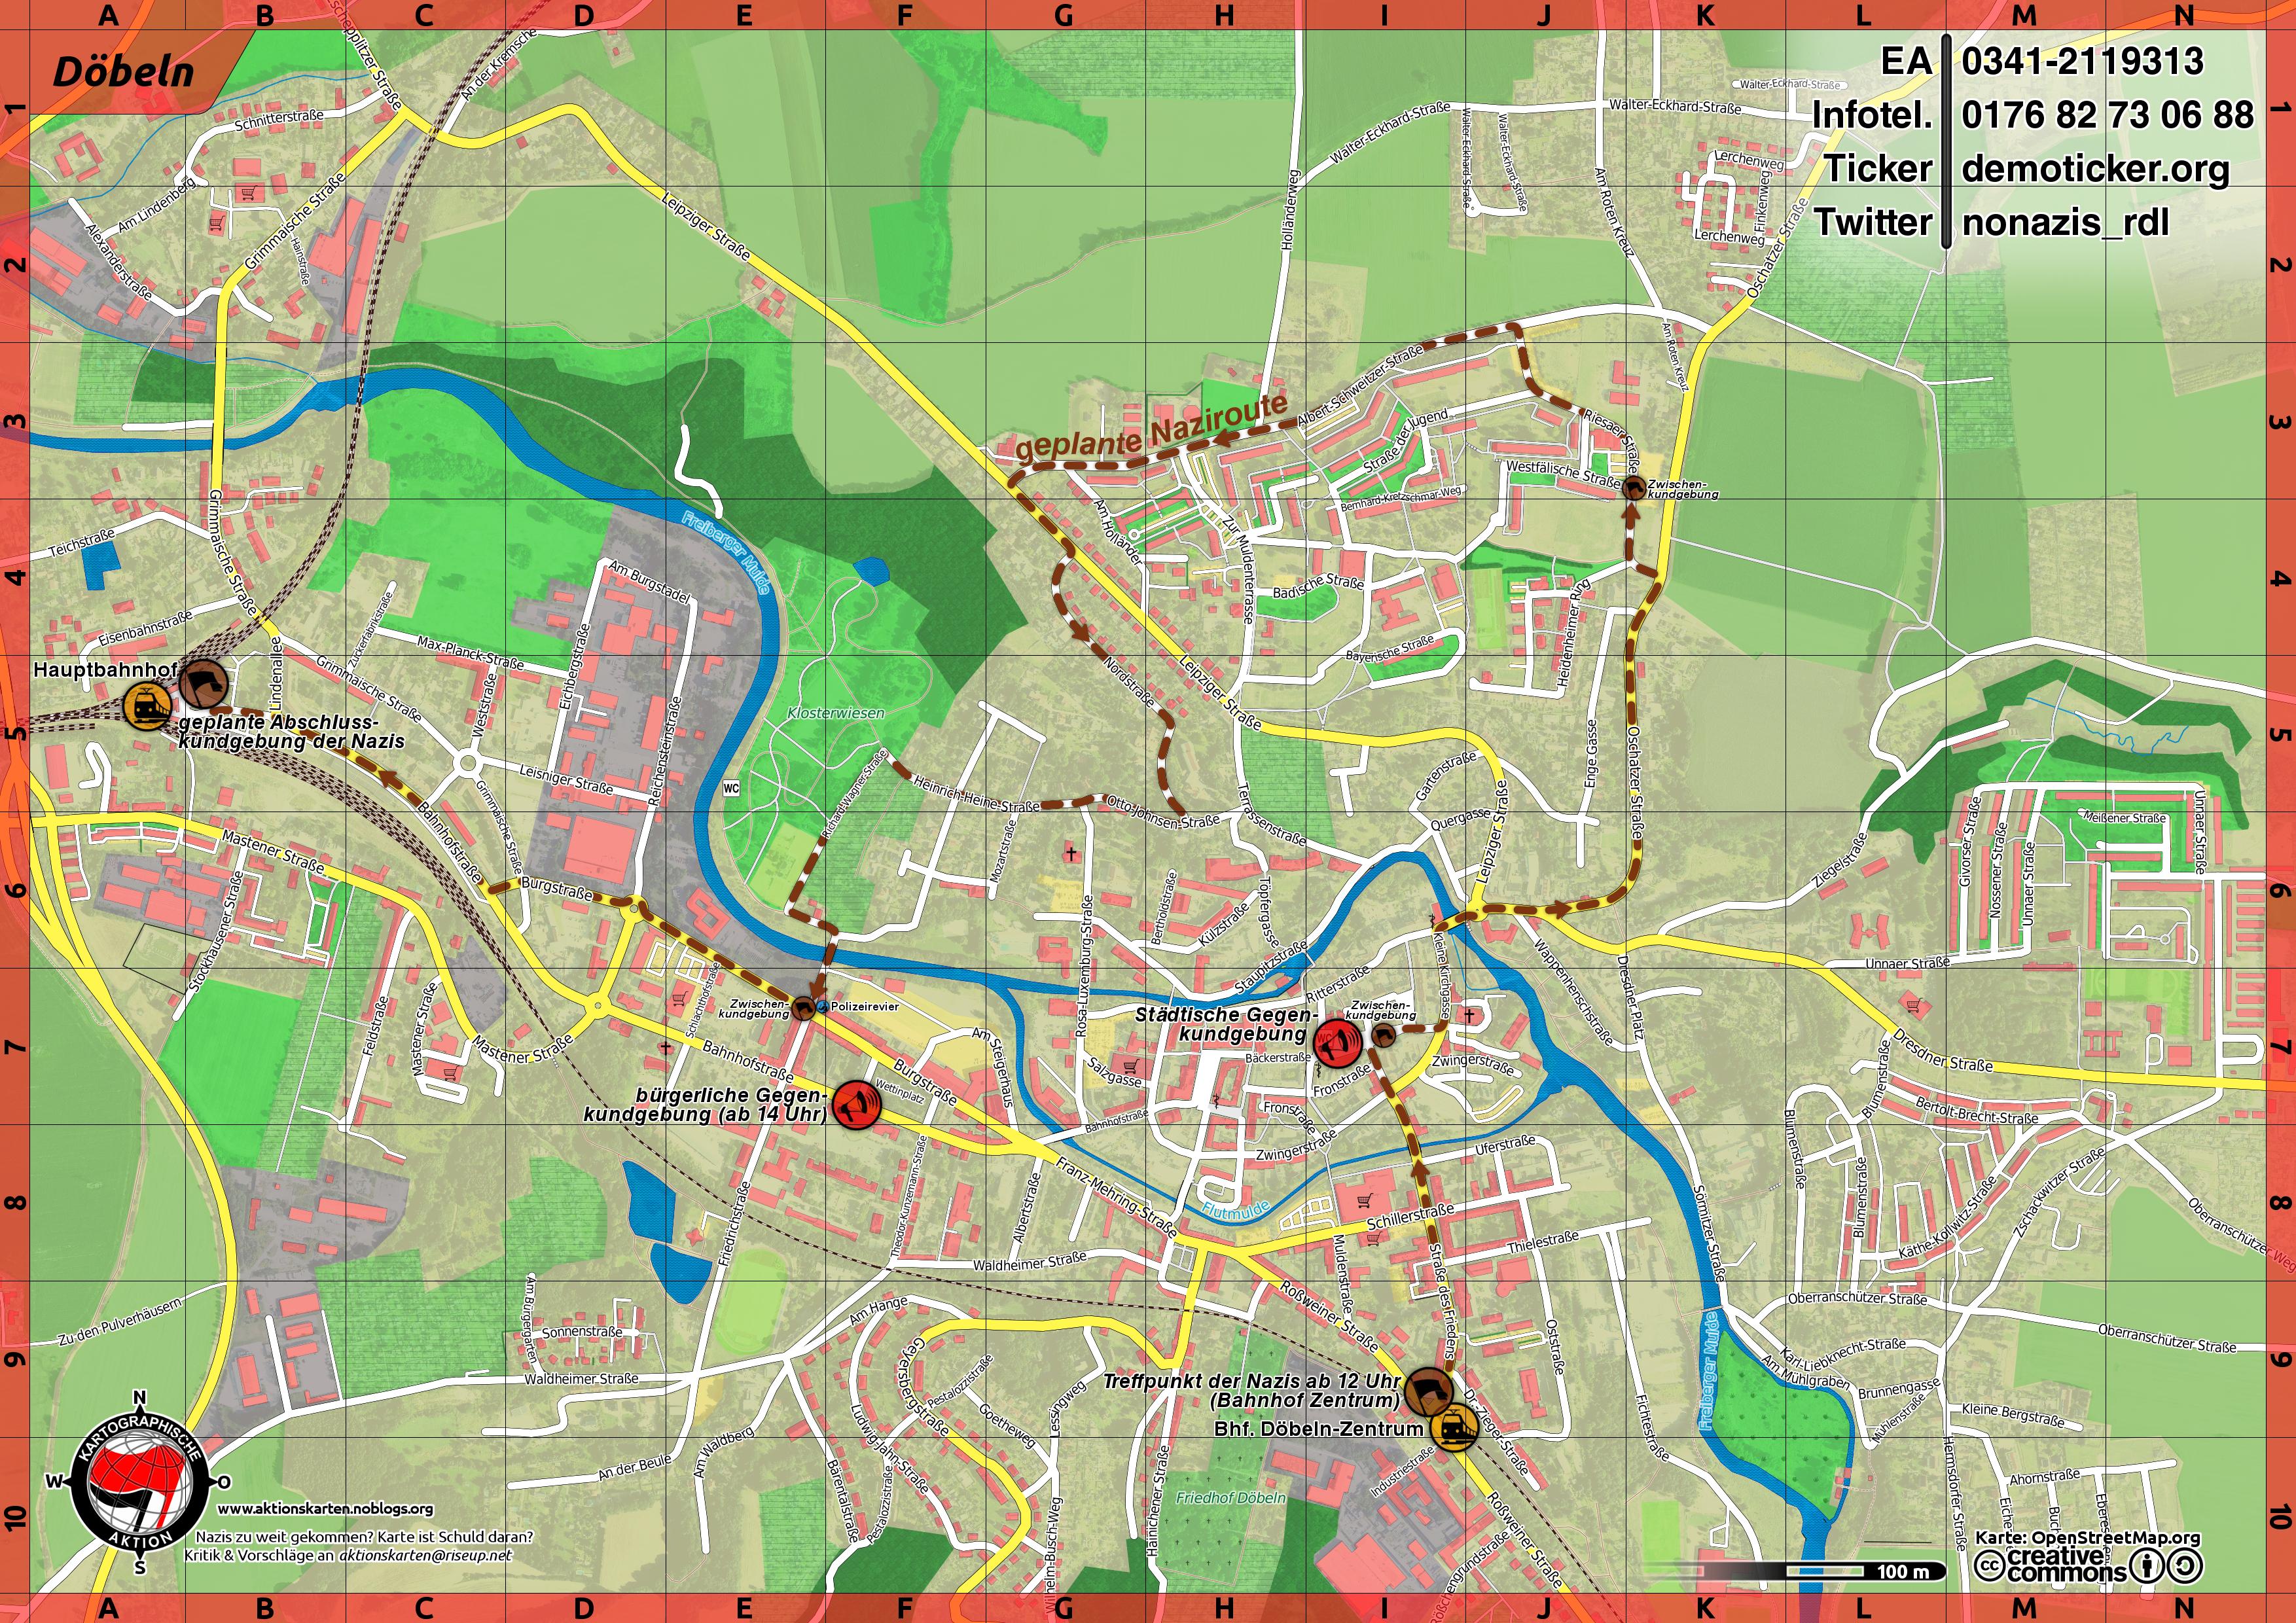 Aktionskarte_04.10.14_druck